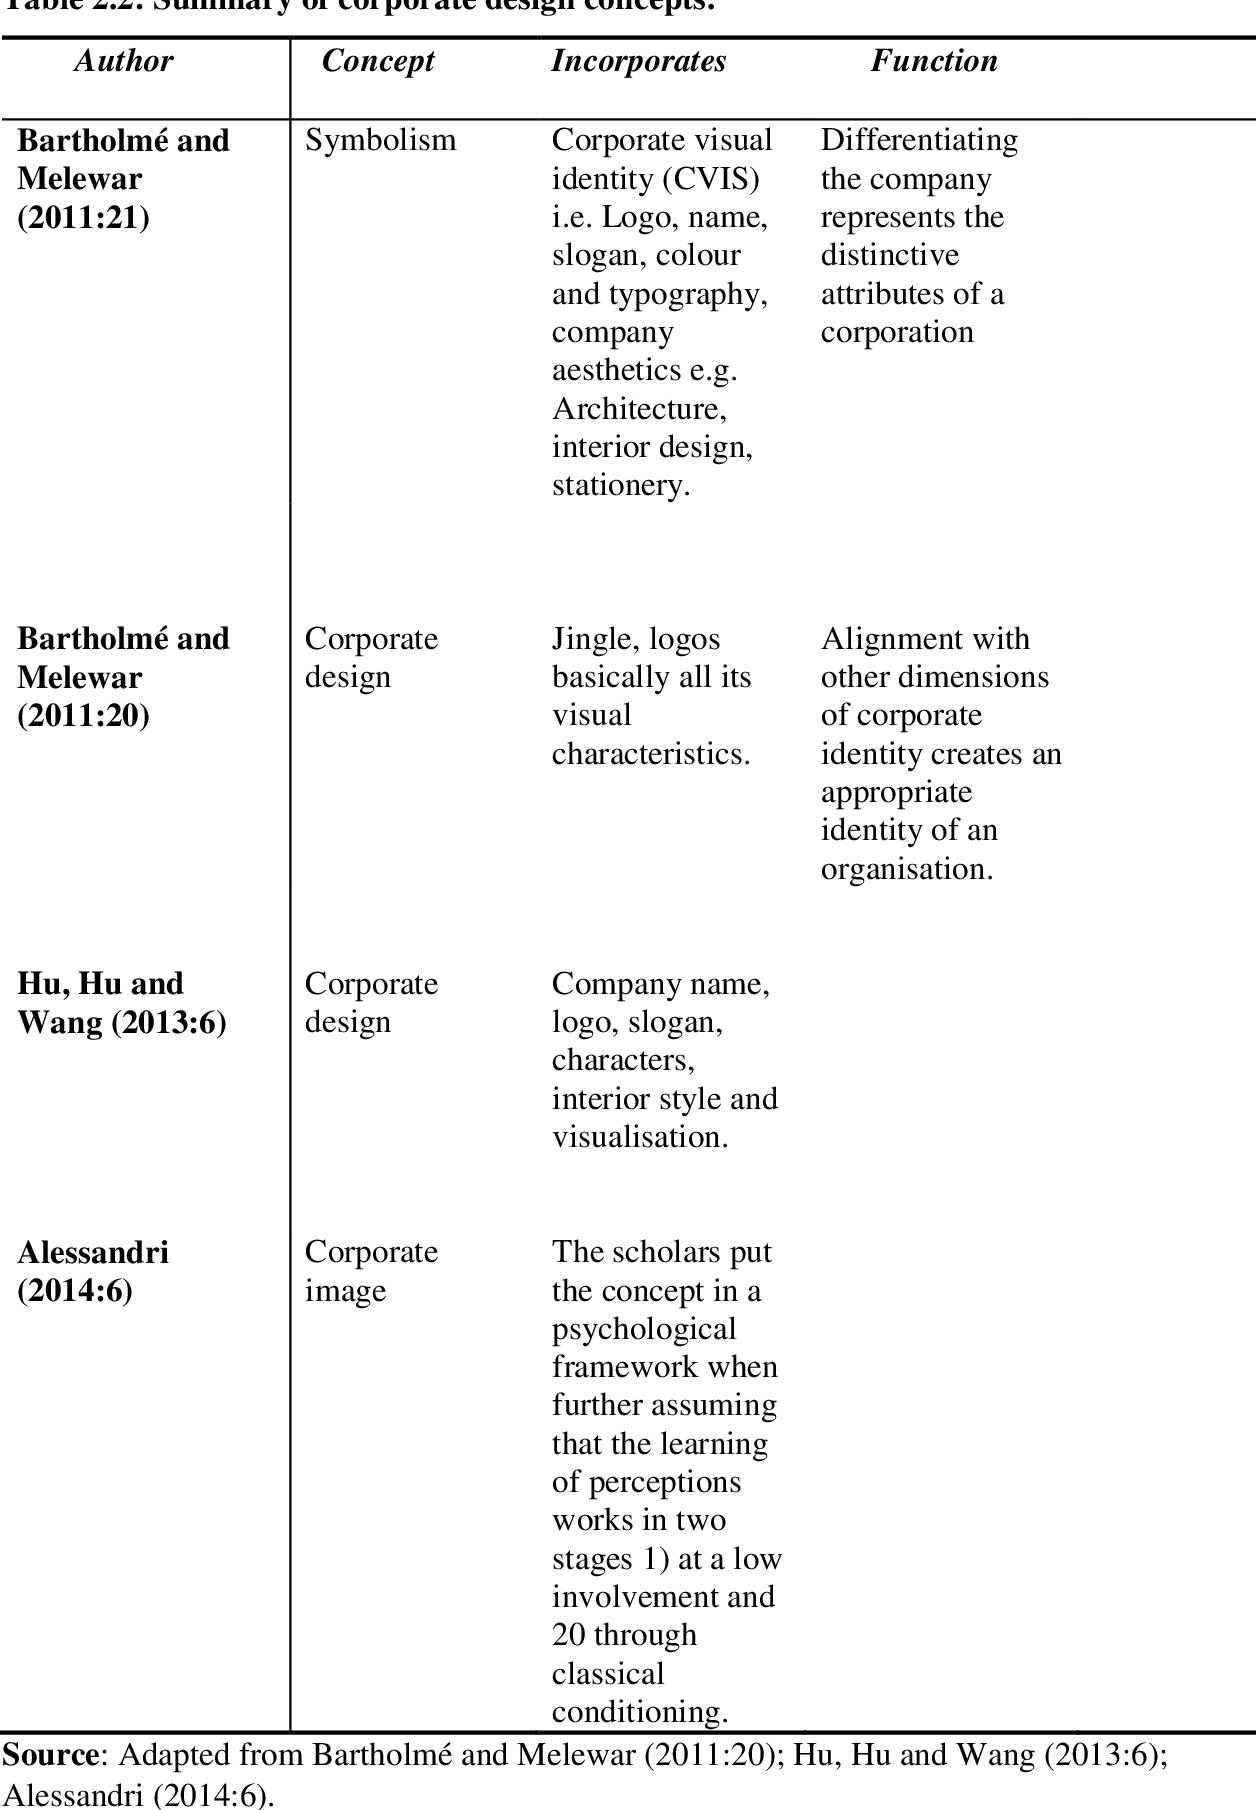 PDF] Developing sustainable corporate identity strategies